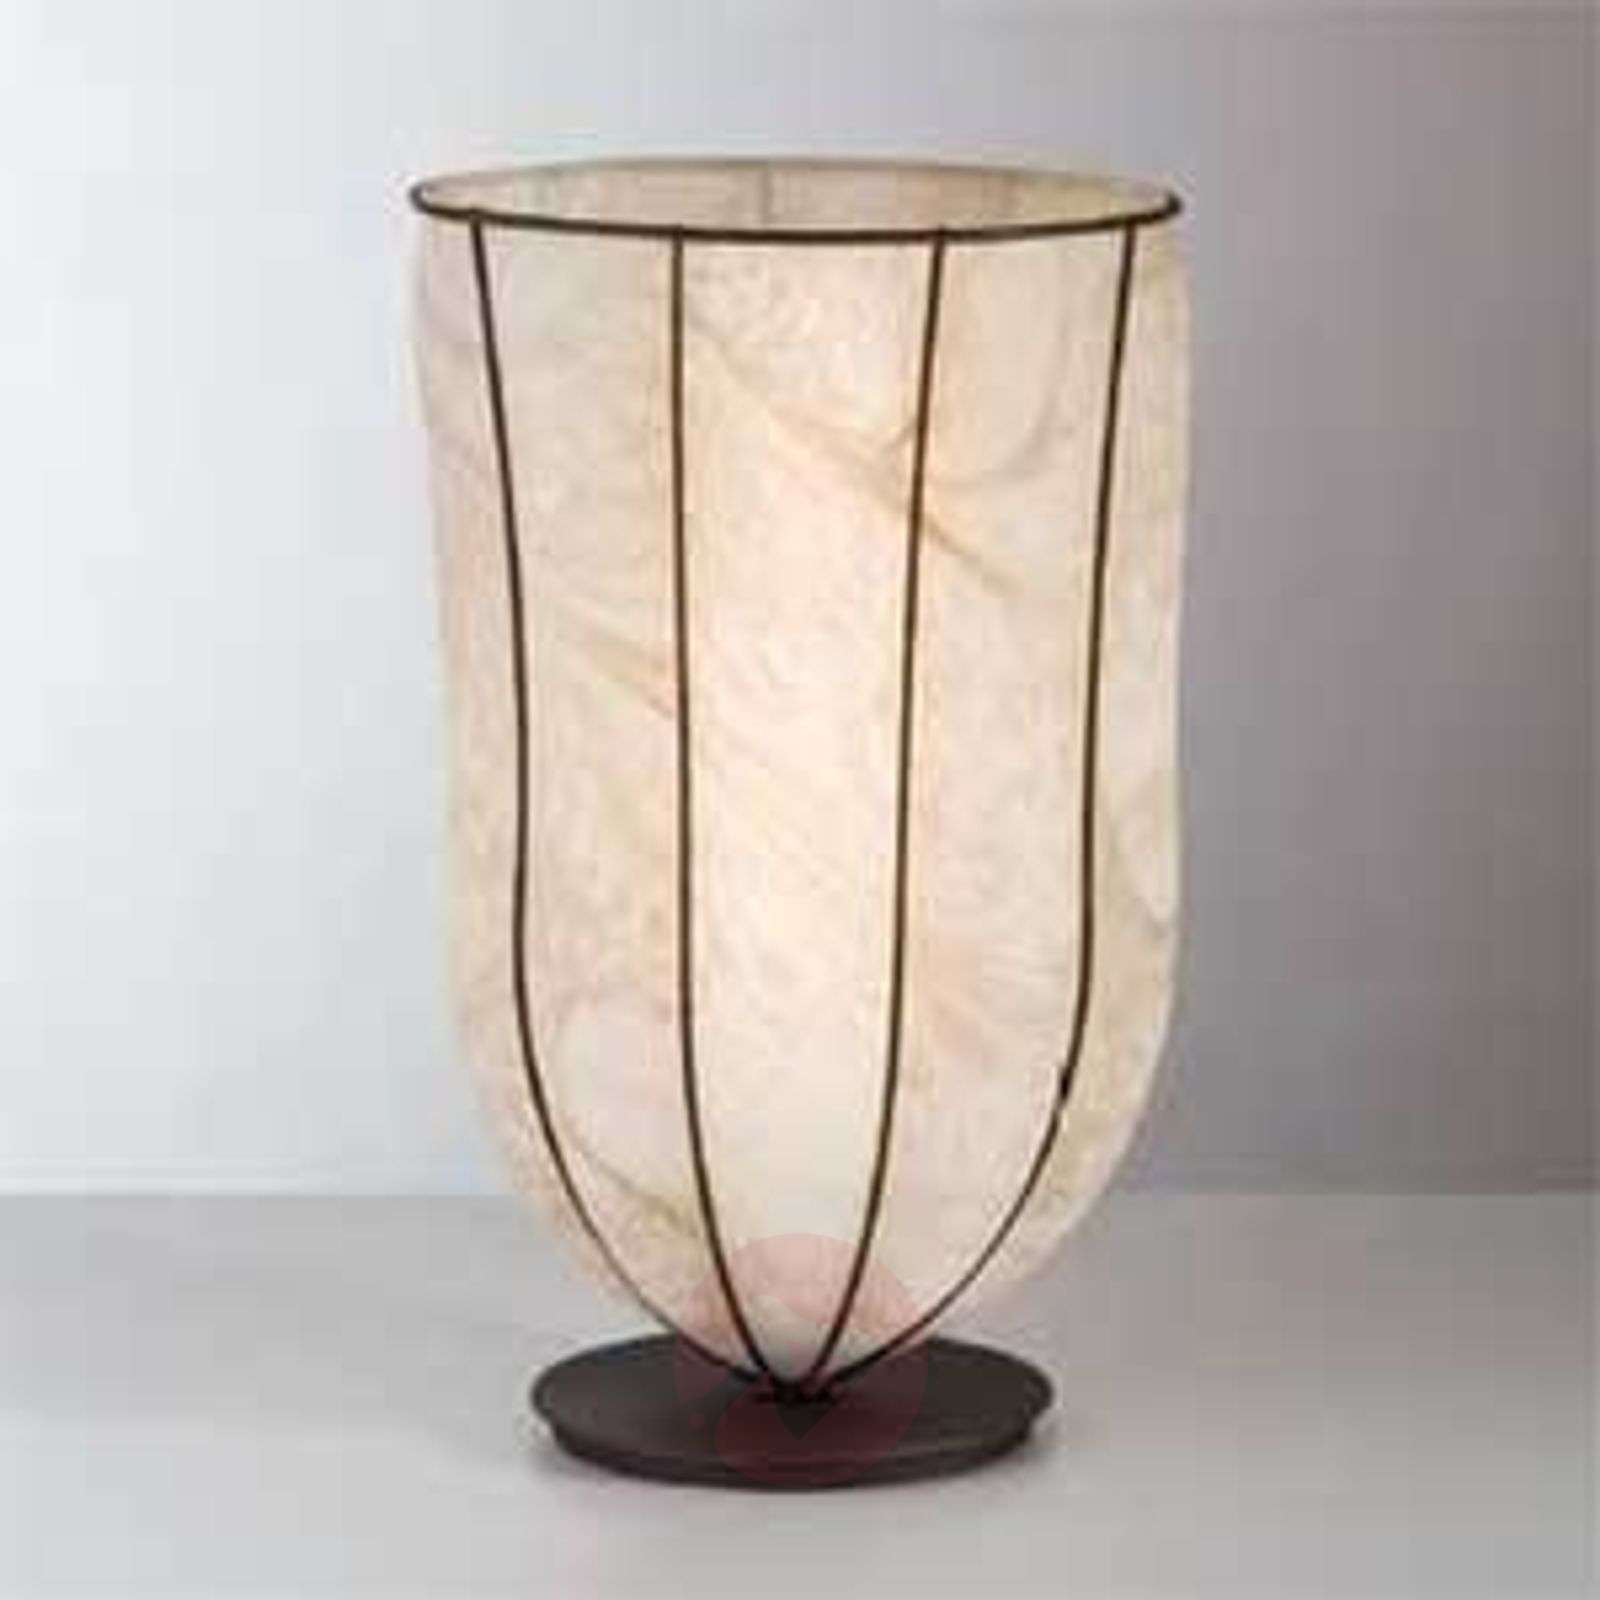 Antique GIARA table lamp-8581047X-01